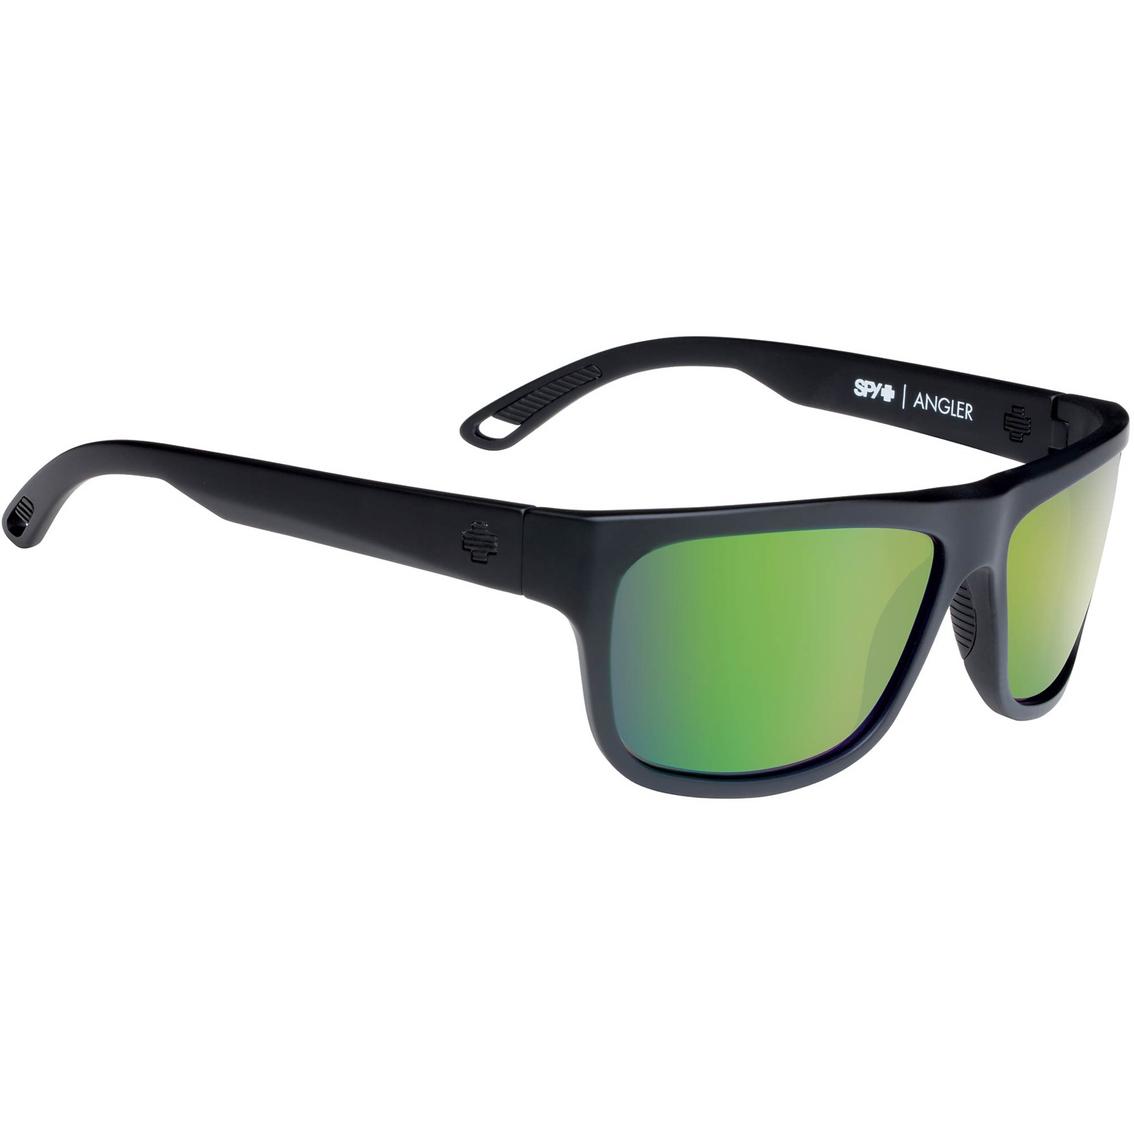 9b6eb12255 Spy Optic Angler Polarized Sunglasses